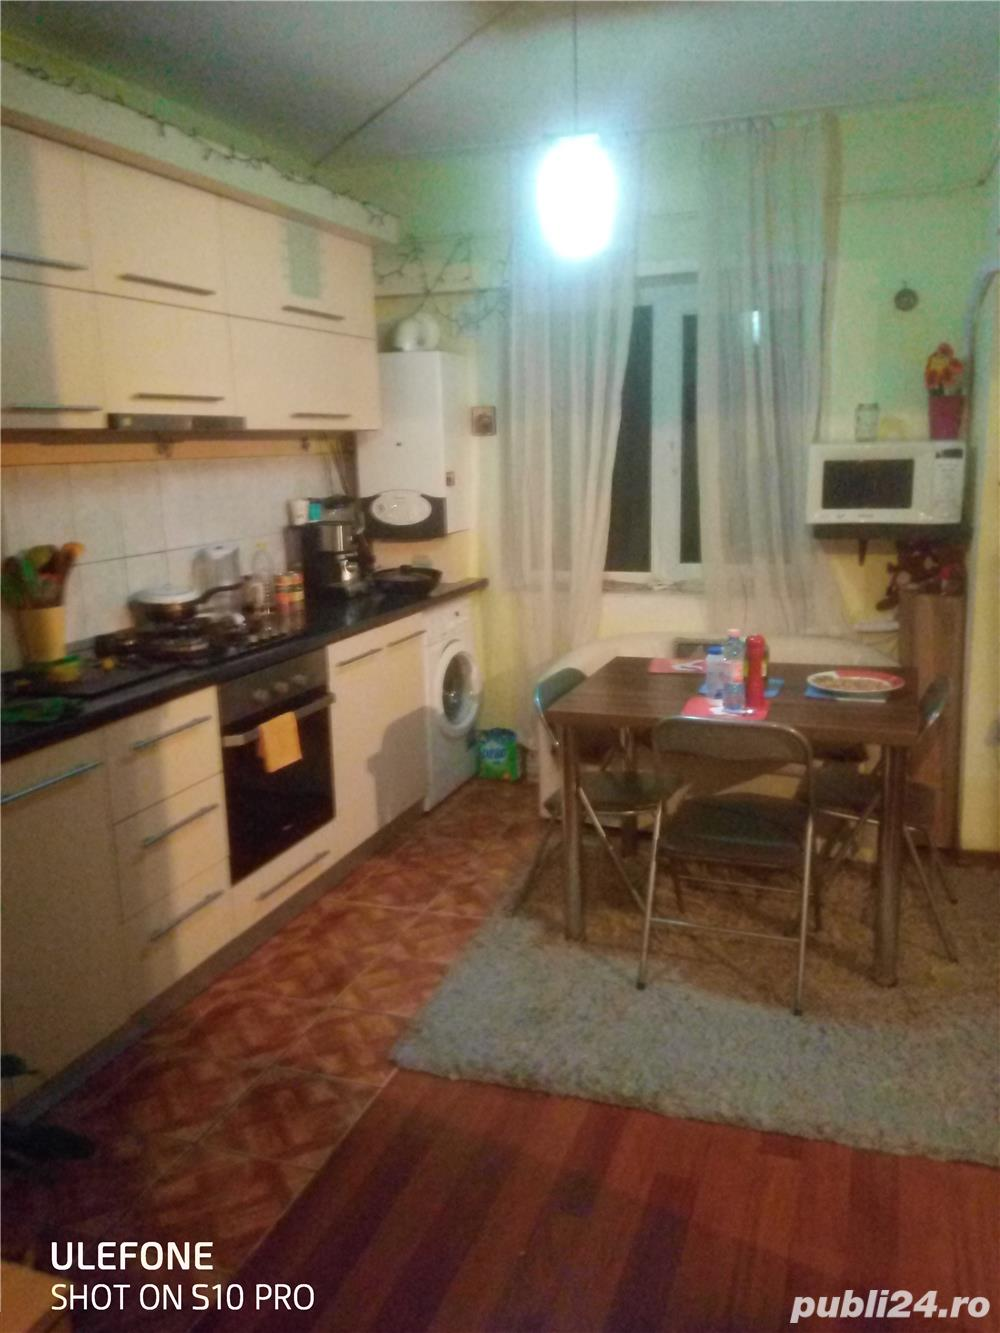 Vând apartament 3 C,Dec. 68 m2 la 52900 merita vazut in Mircea cel bătrân